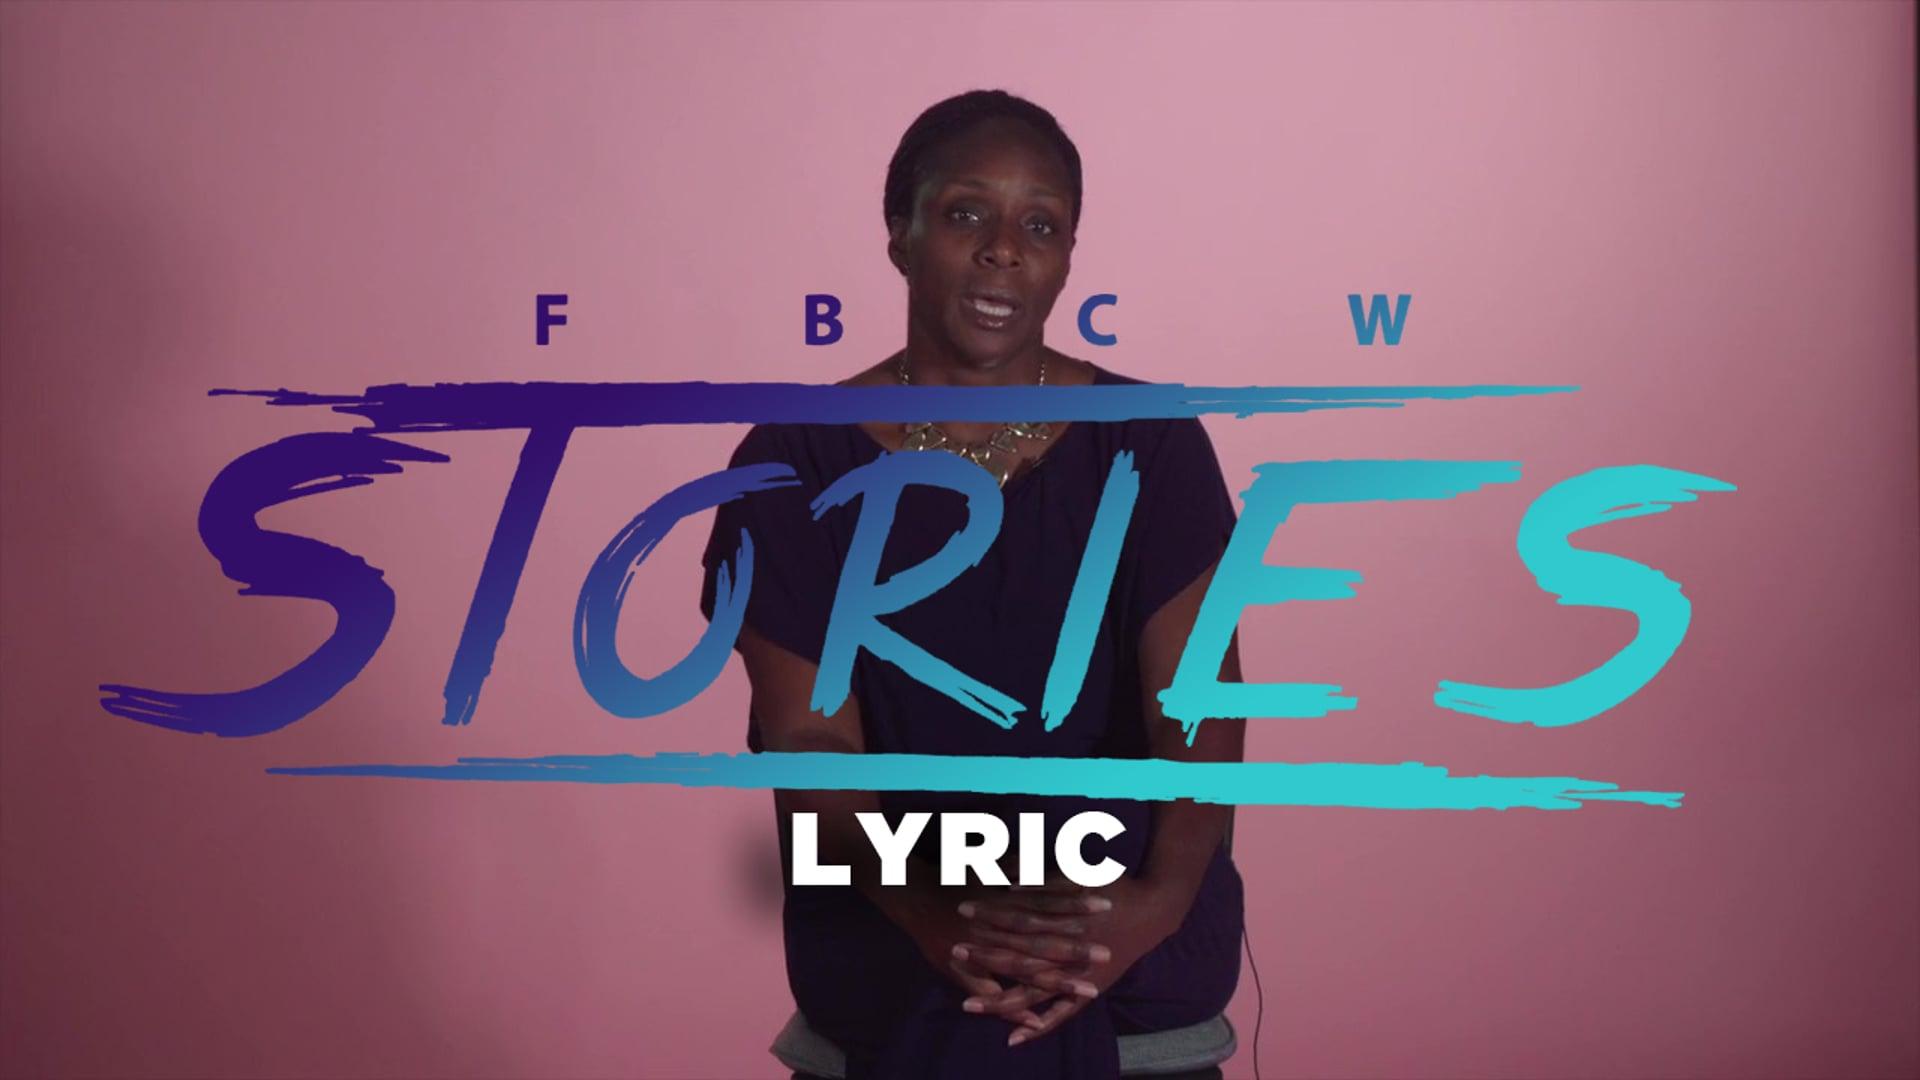 FBCW Stories Lyric